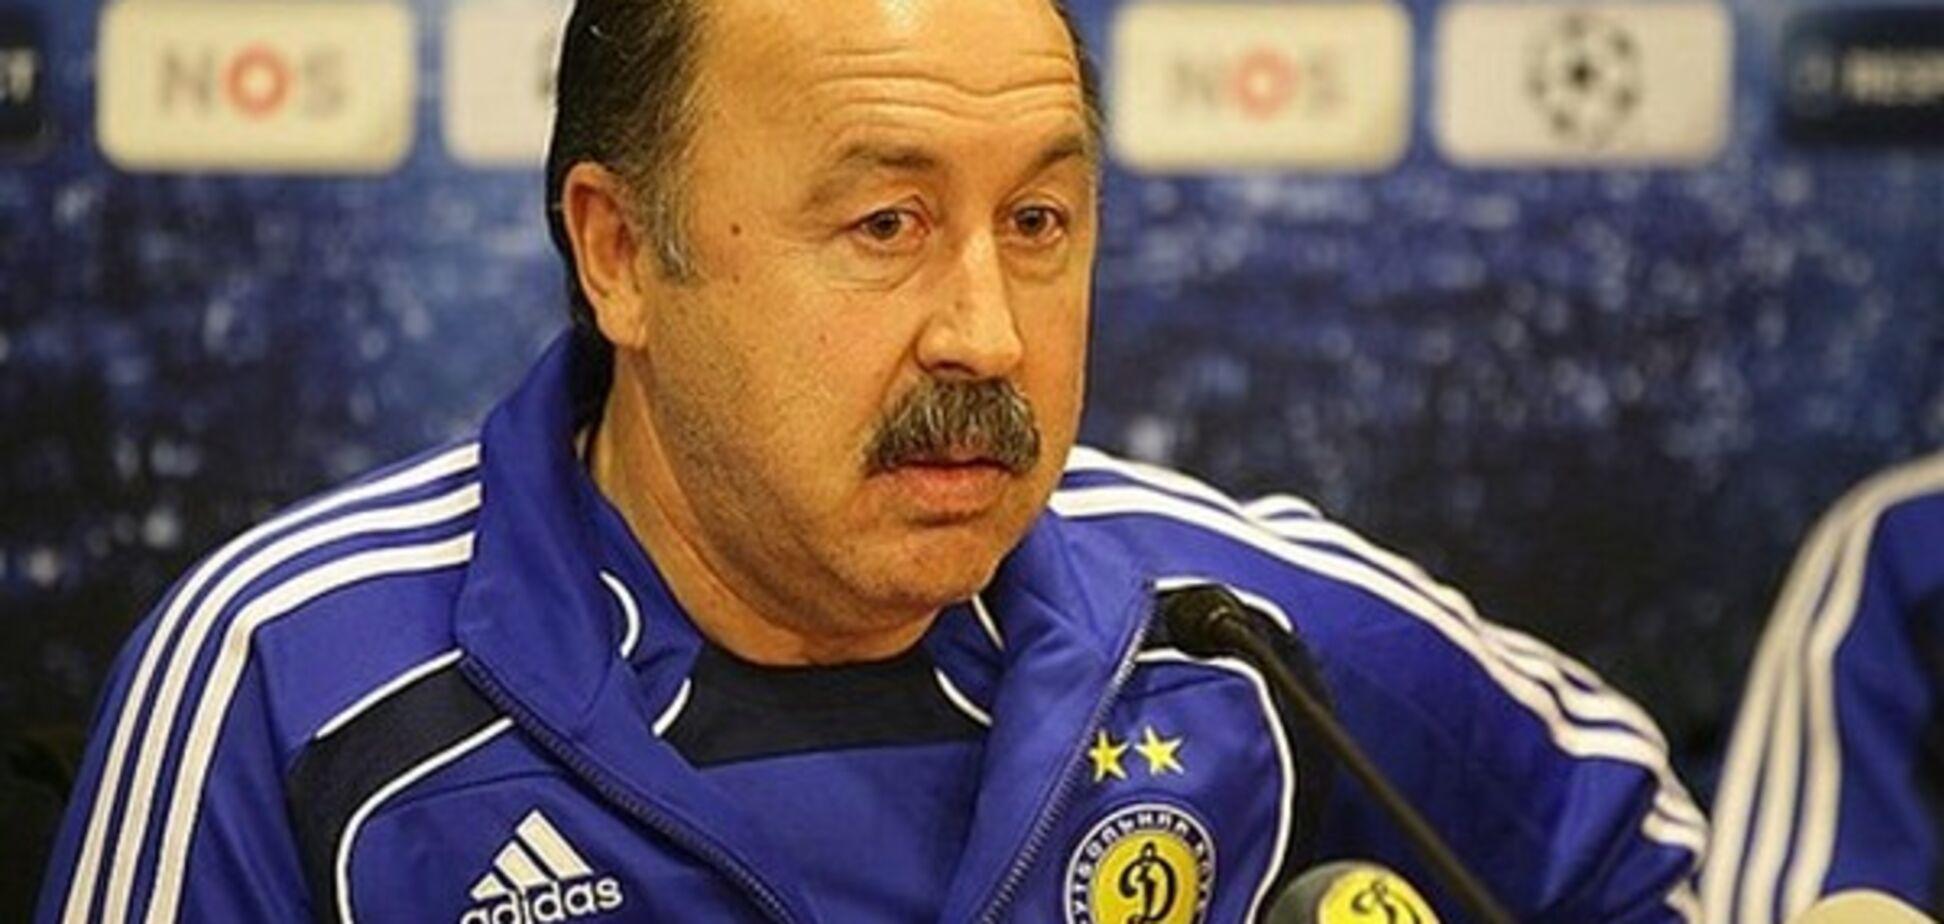 Экс-тренер 'Динамо' Киев установил рекорд в российской Госдуме